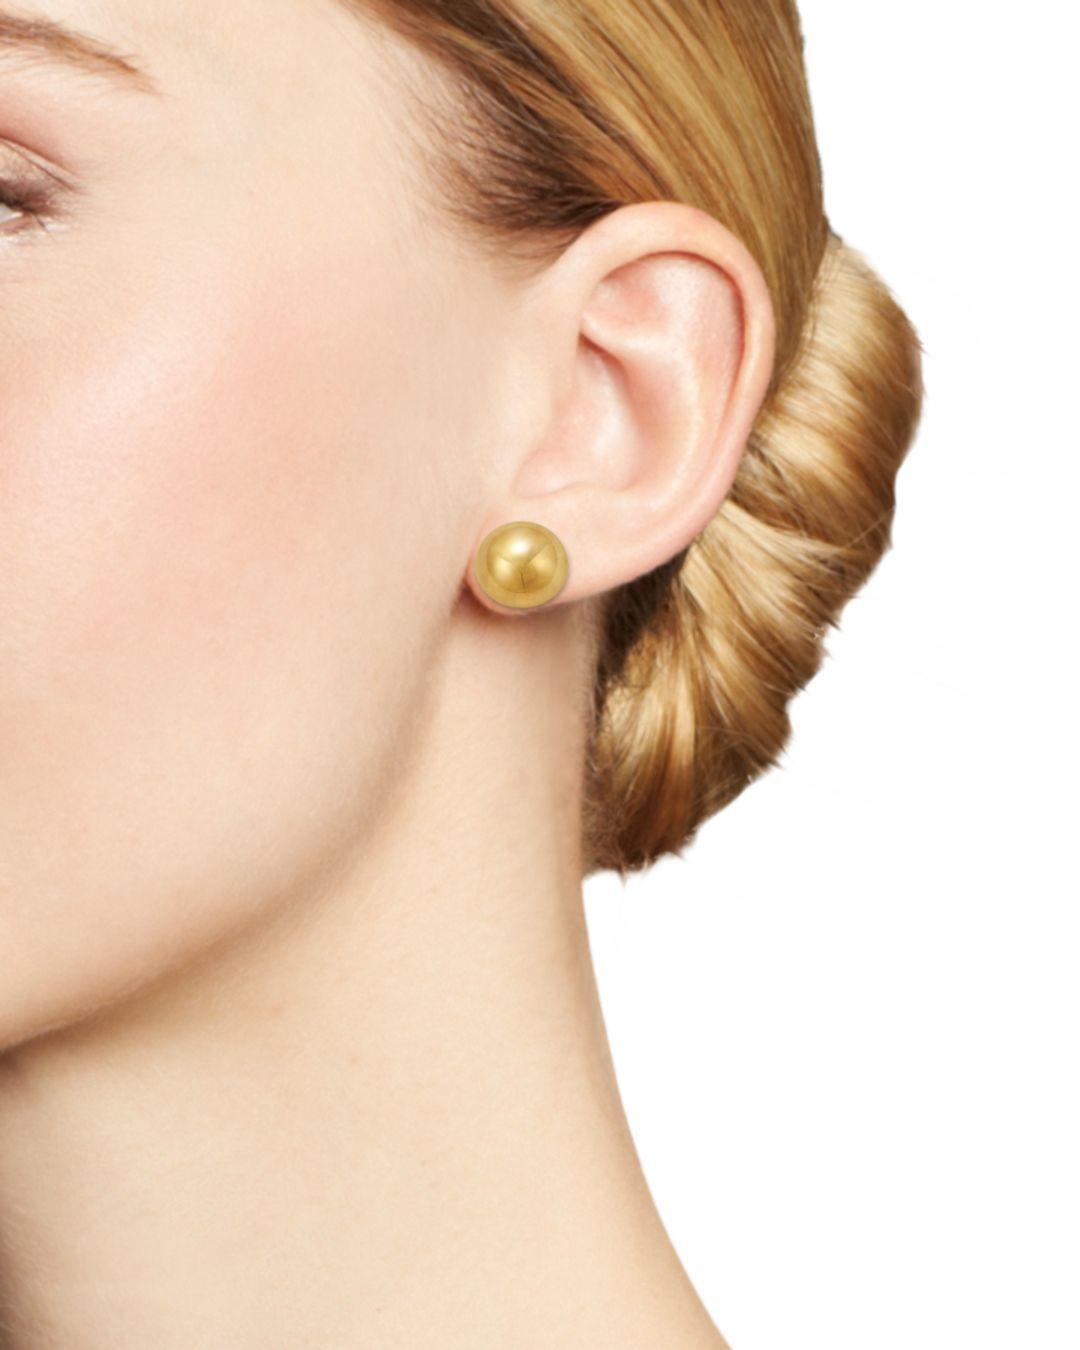 Bloomingdale's 14k Yellow Gold Polished Button Earrings in Metallic